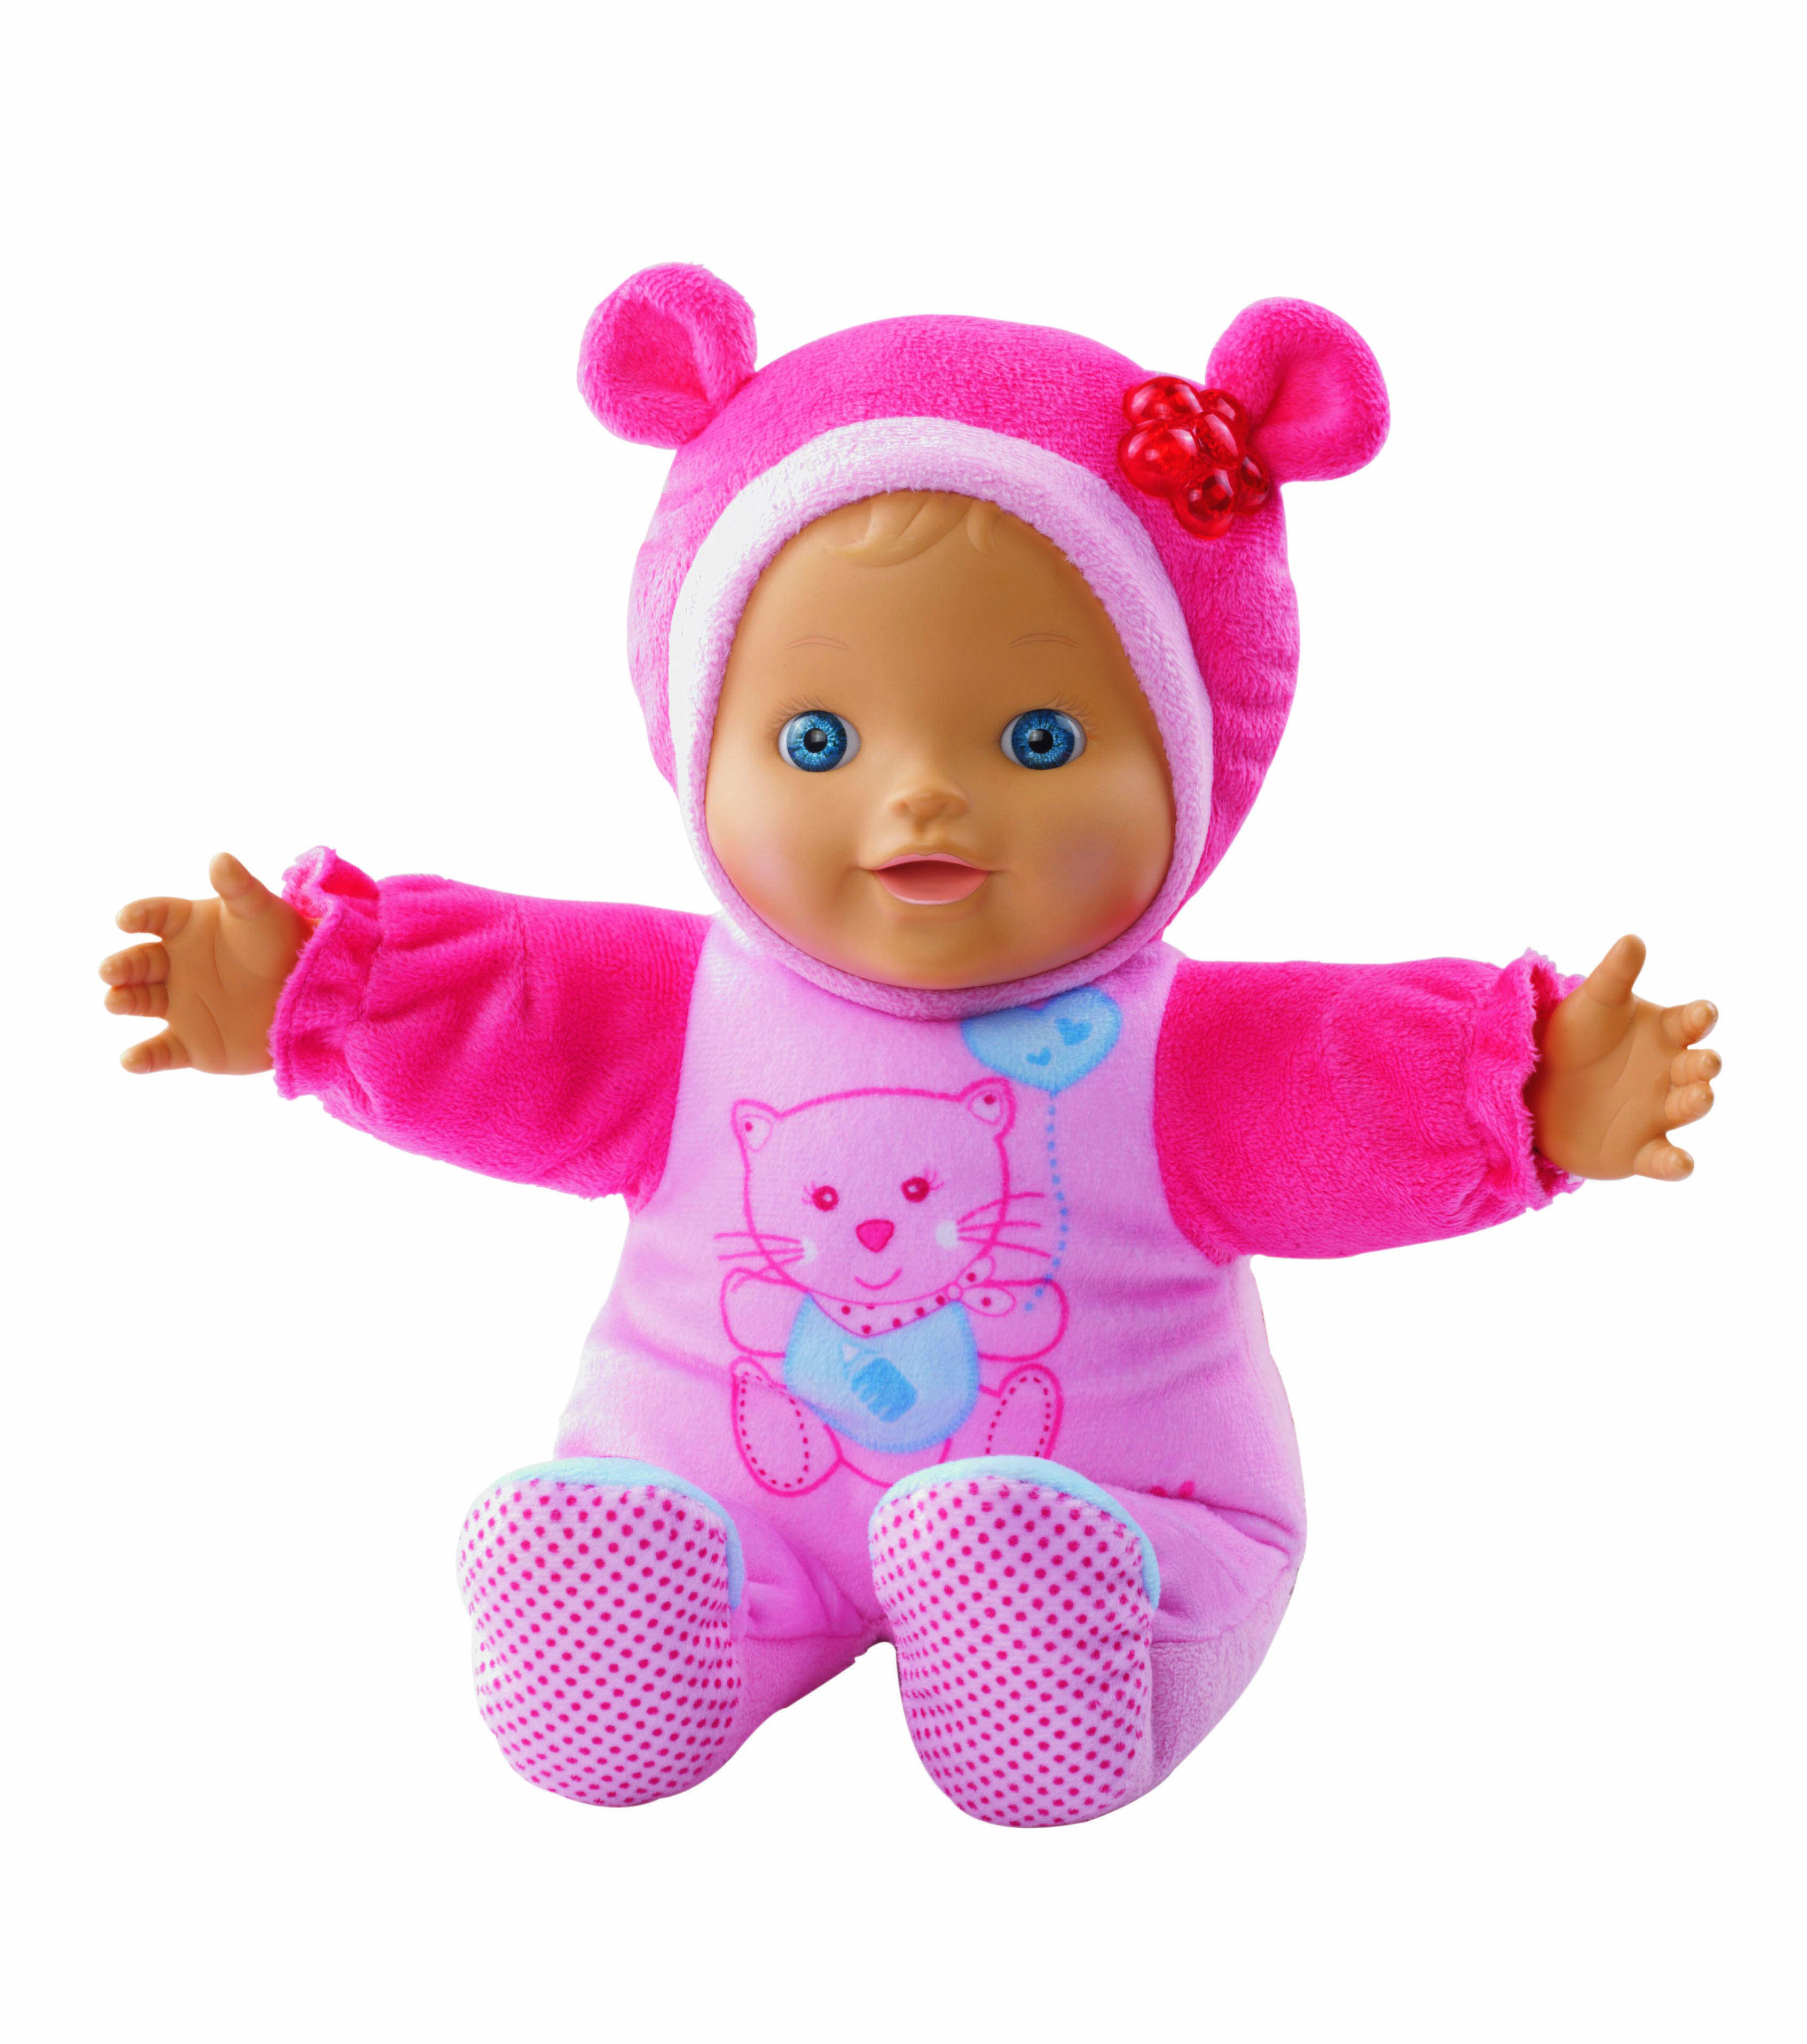 Rosi bebé, la primera muñeca interactiva de VTech